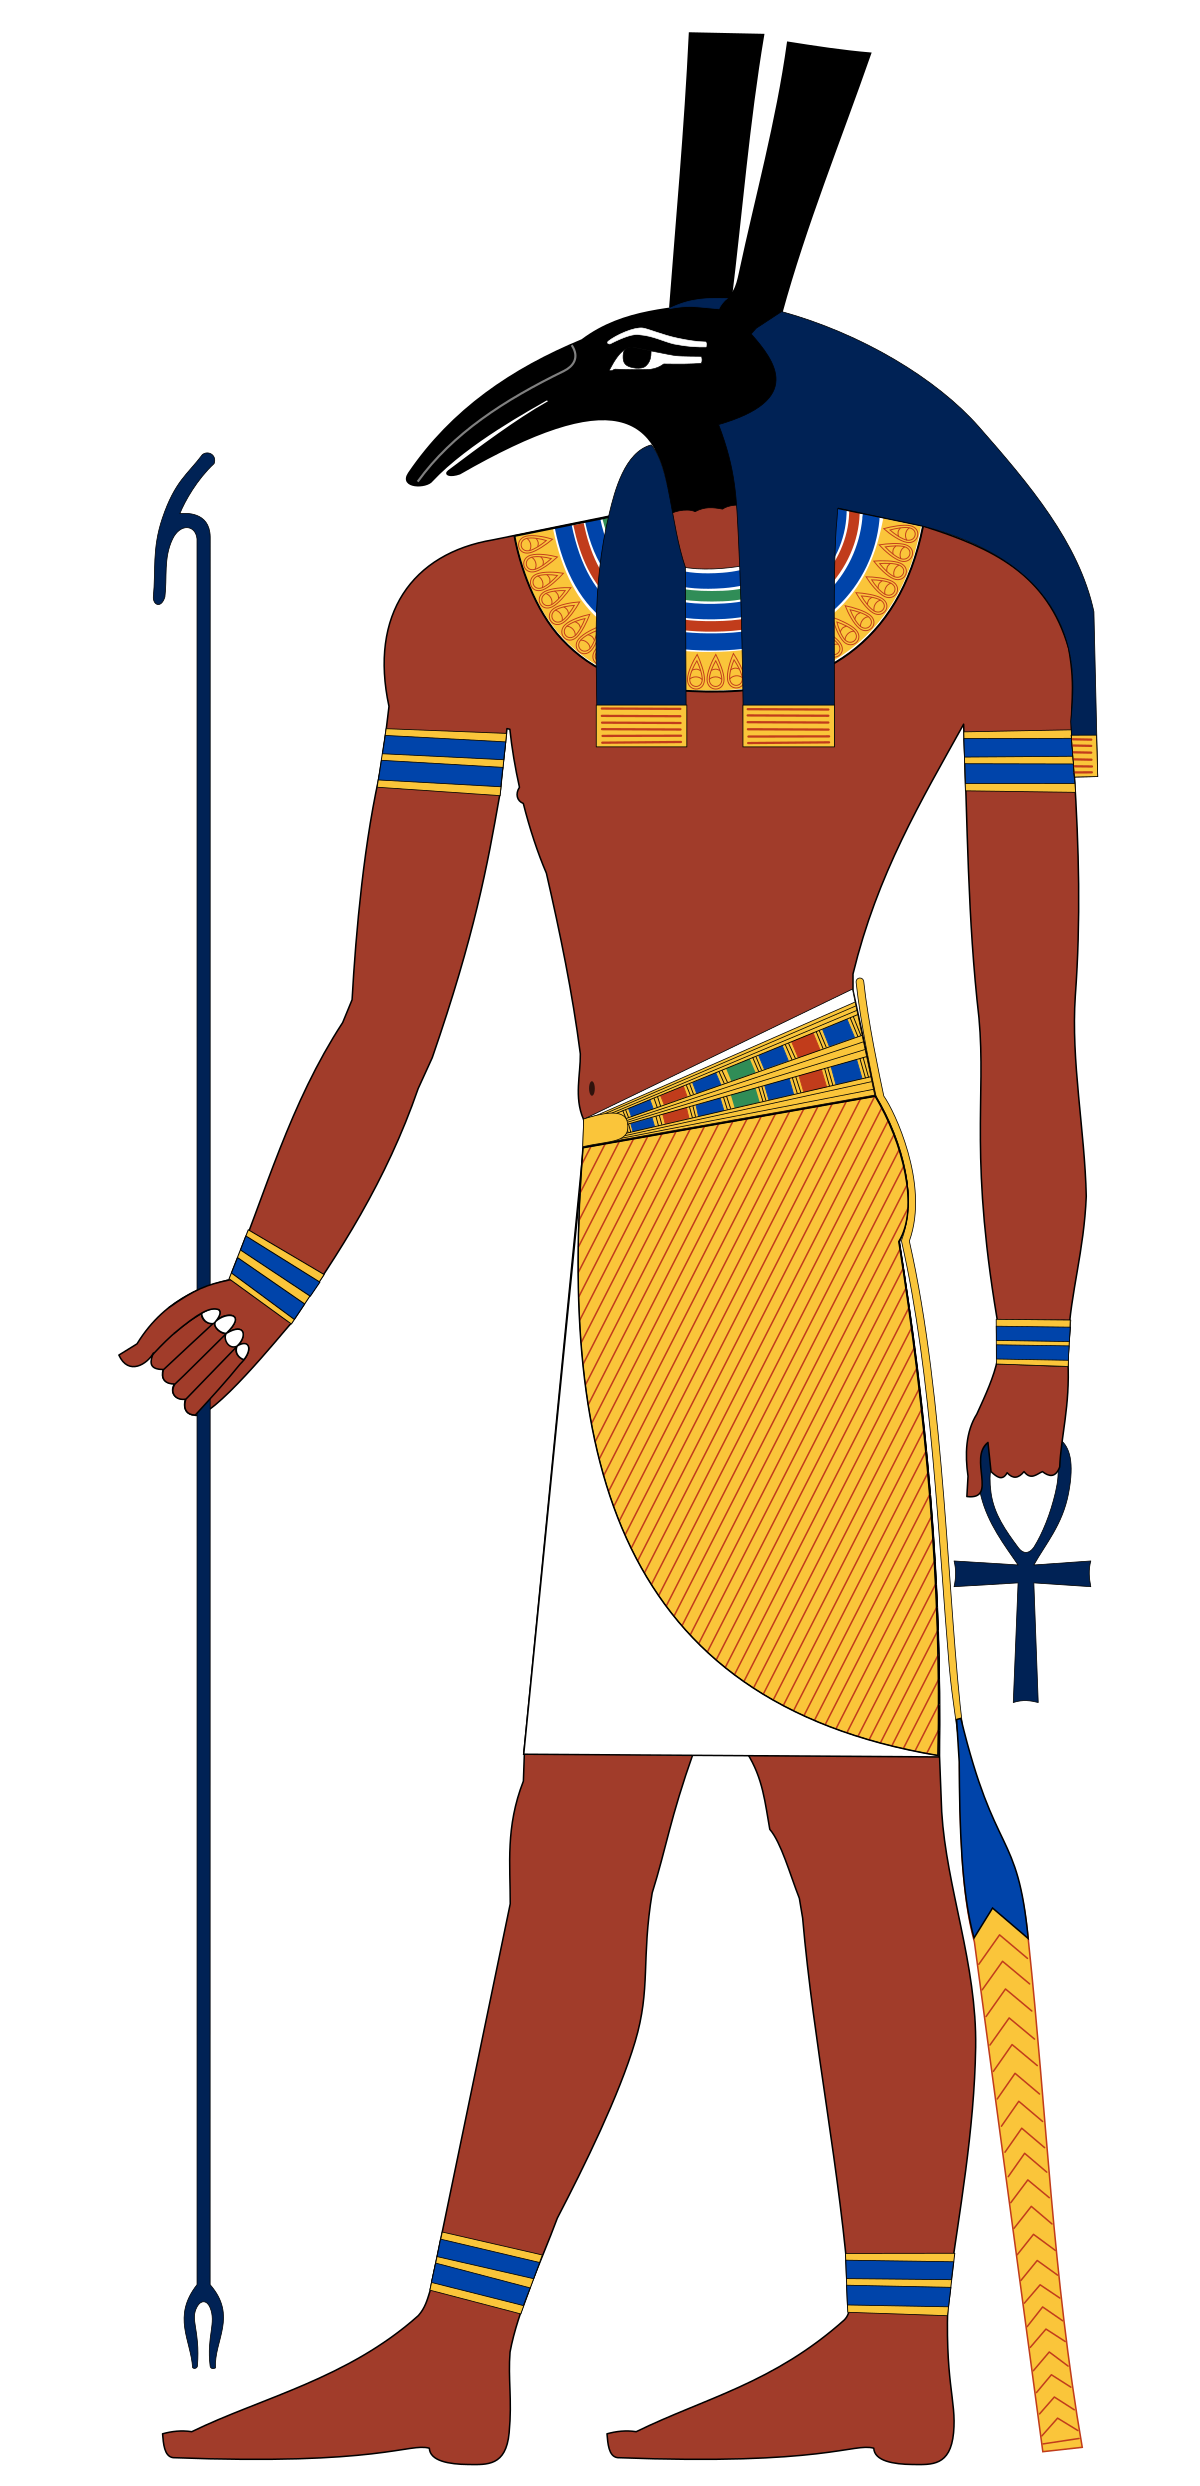 Apophis god of egypt clipart jpg black and white library Set (deity) - Wikipedia jpg black and white library